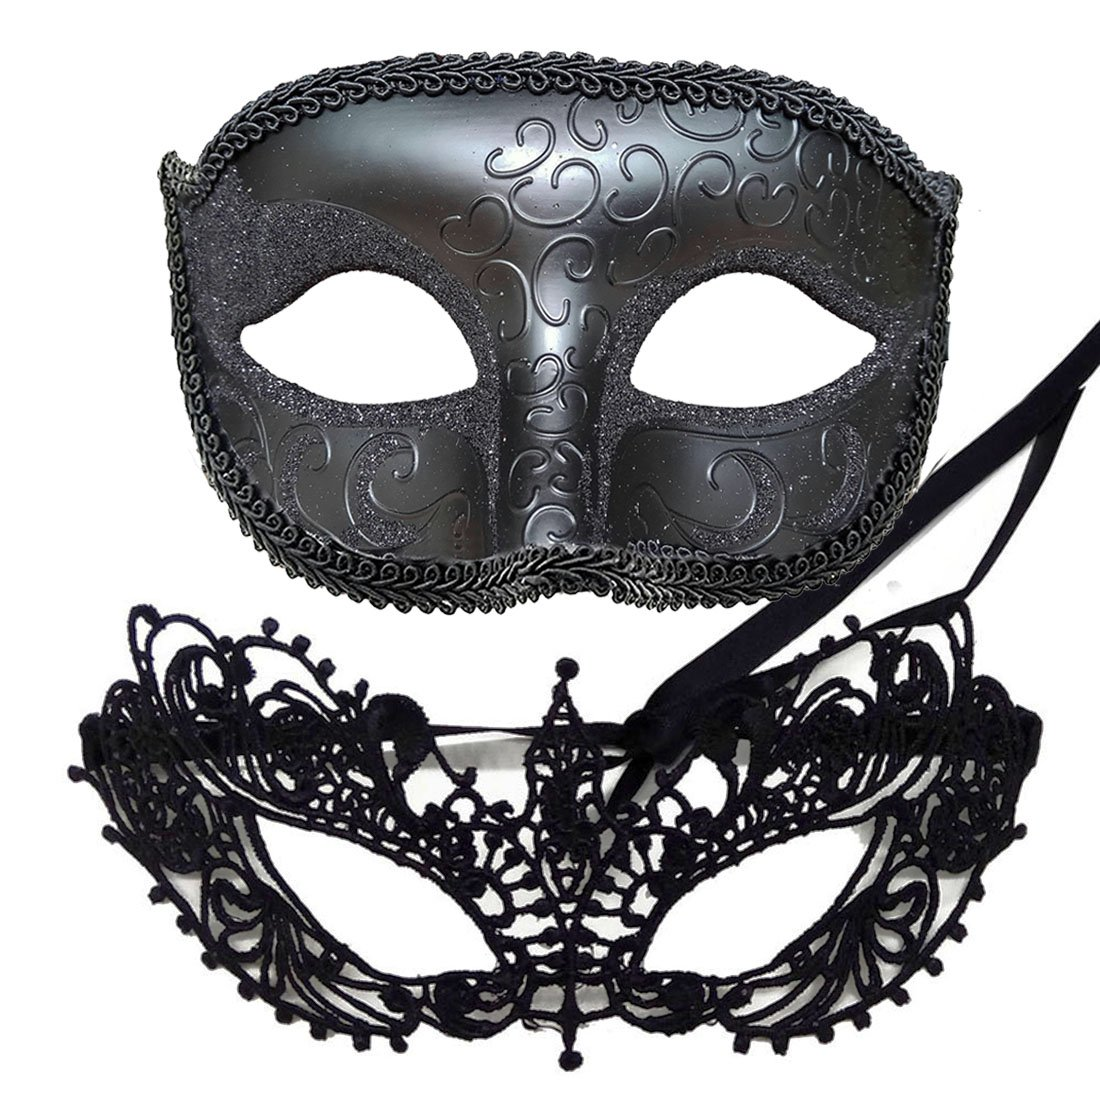 IDOXE Wonderful Mask for Couples Masquerade Ball Goddess Venetian